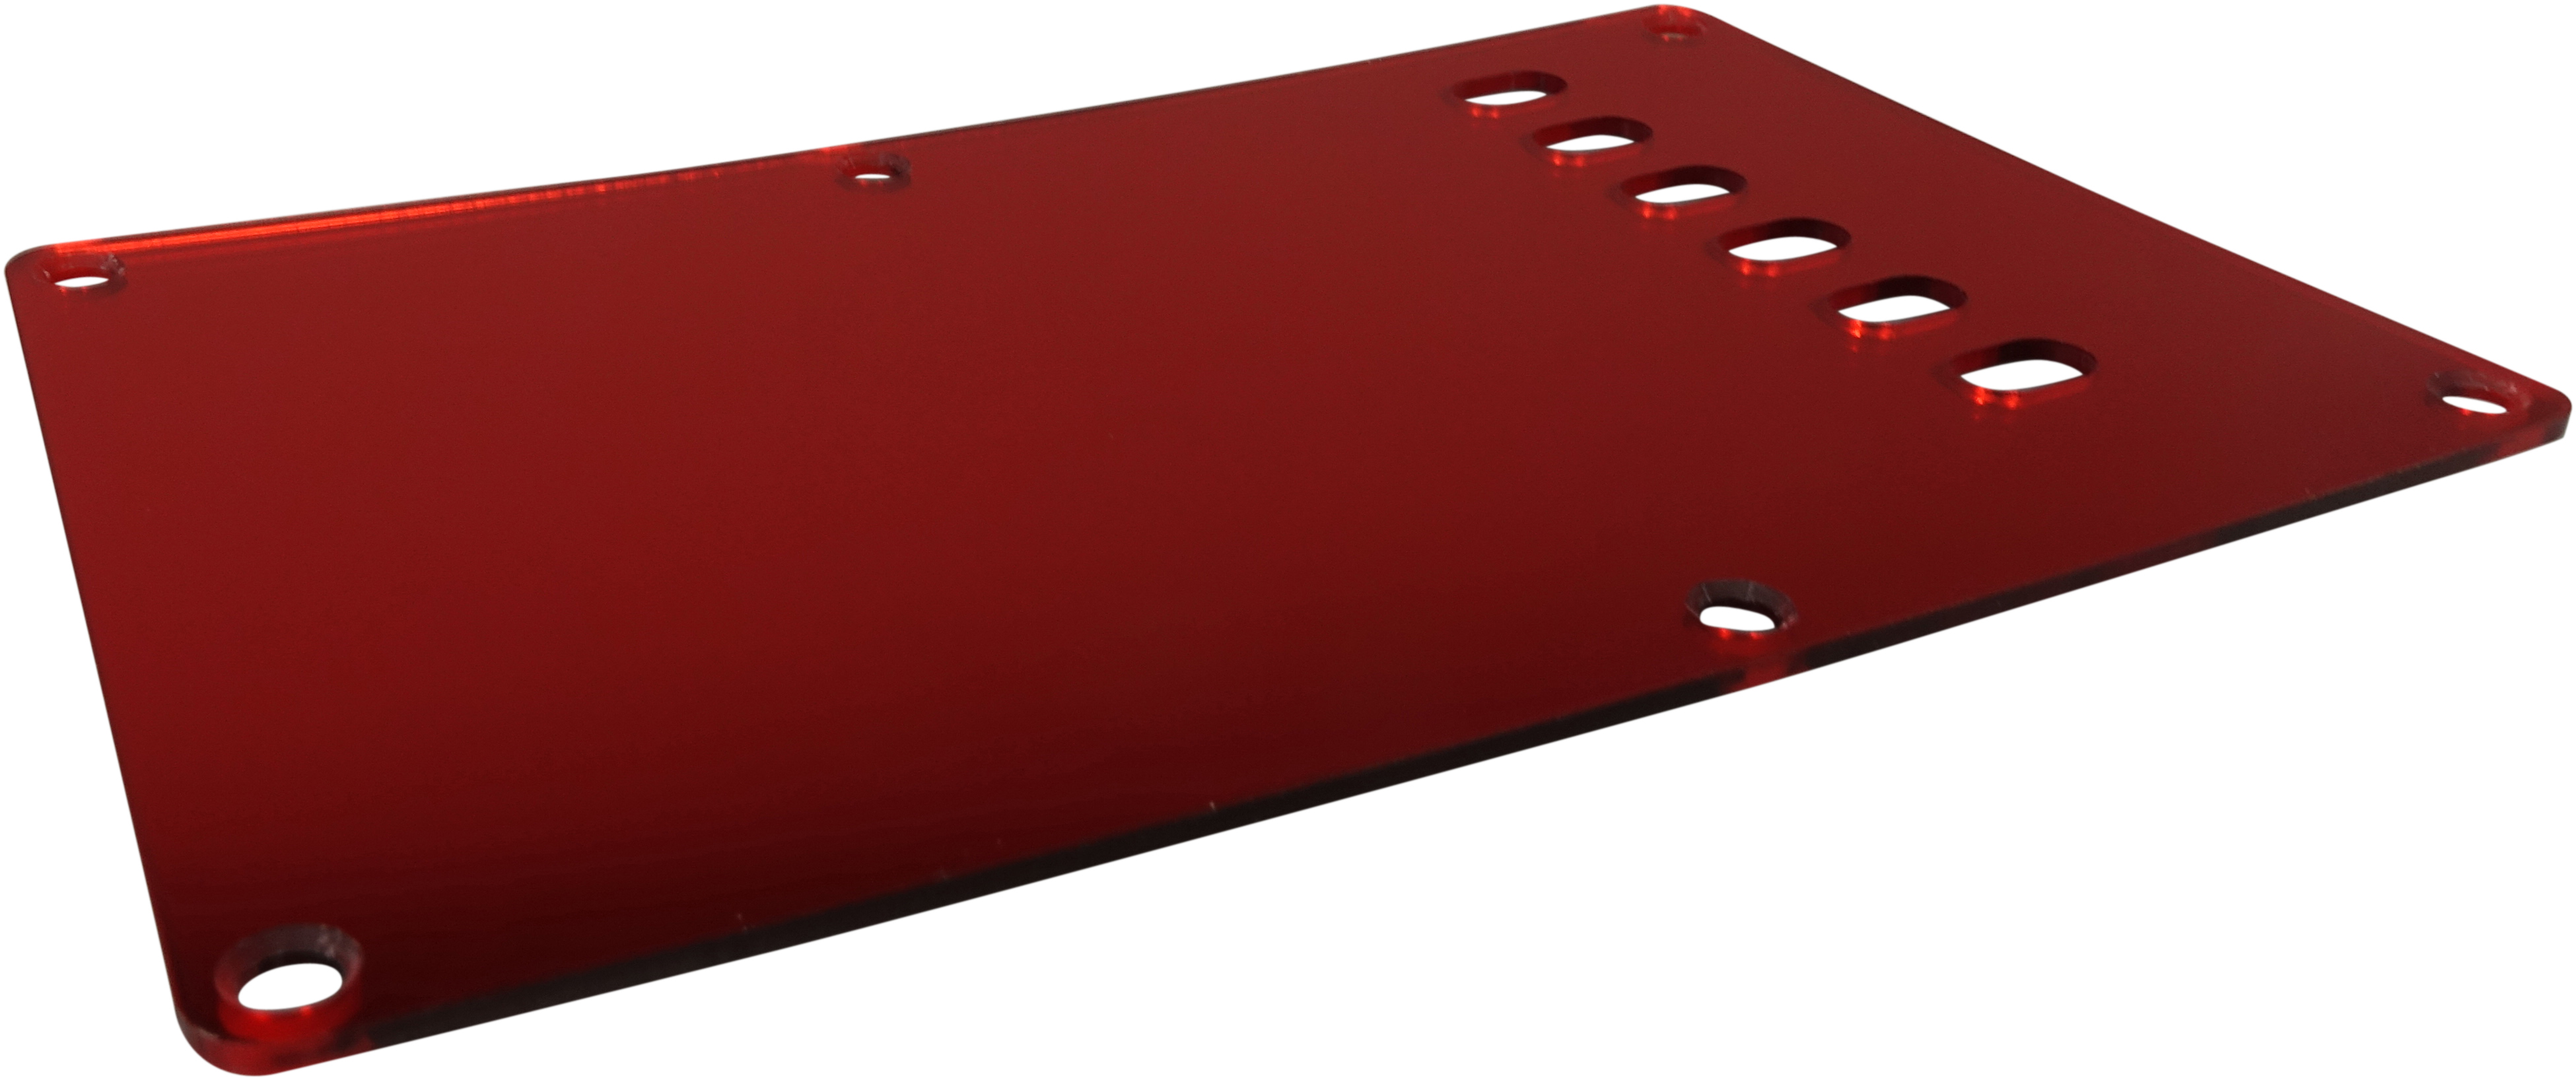 Toronzo Backplate BP-2PLY-Mirror Red